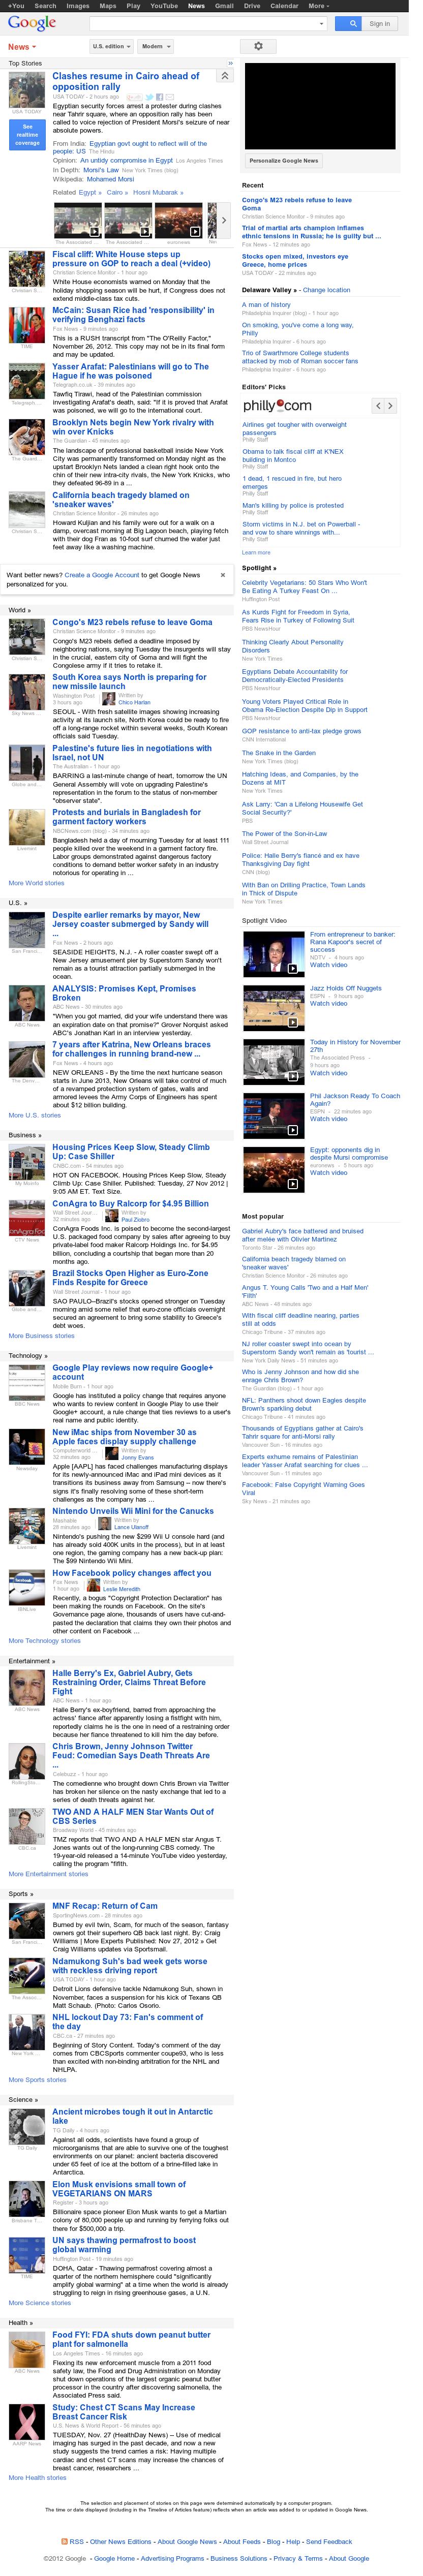 Google News at Tuesday Nov. 27, 2012, 3:09 p.m. UTC